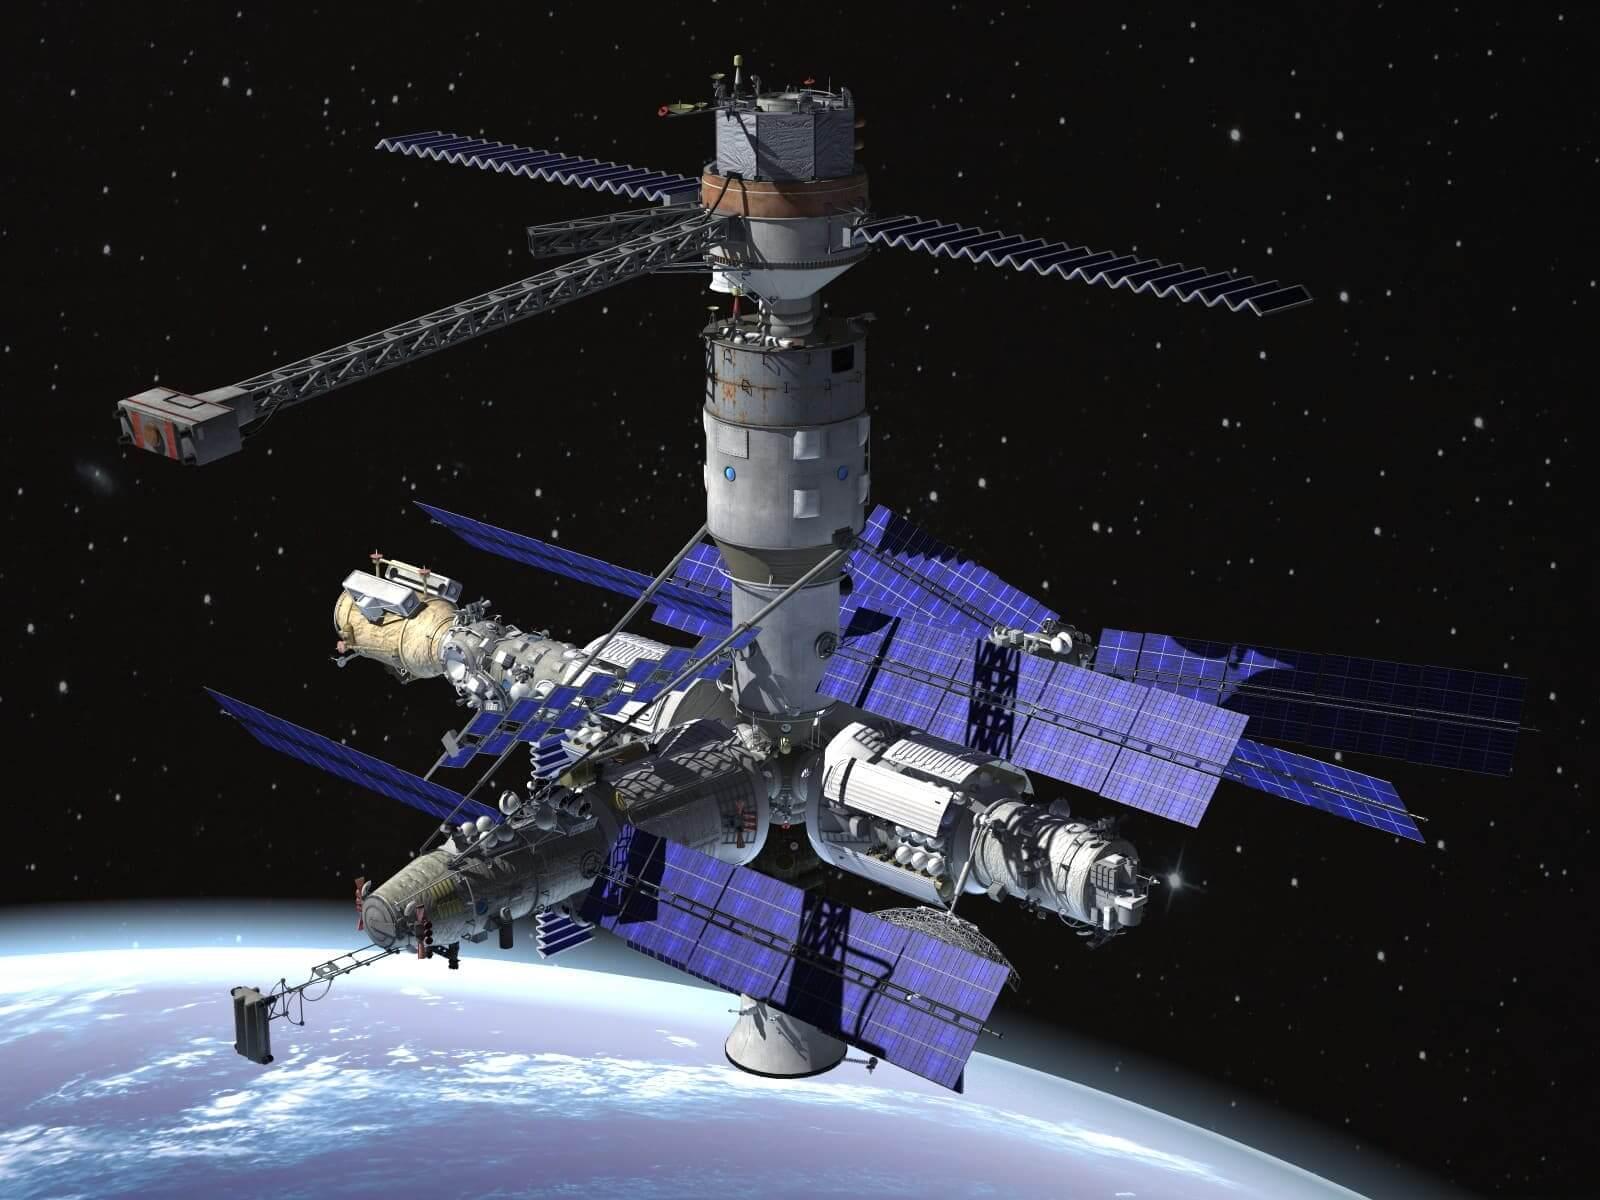 Mir Space Station Complex 3d Model